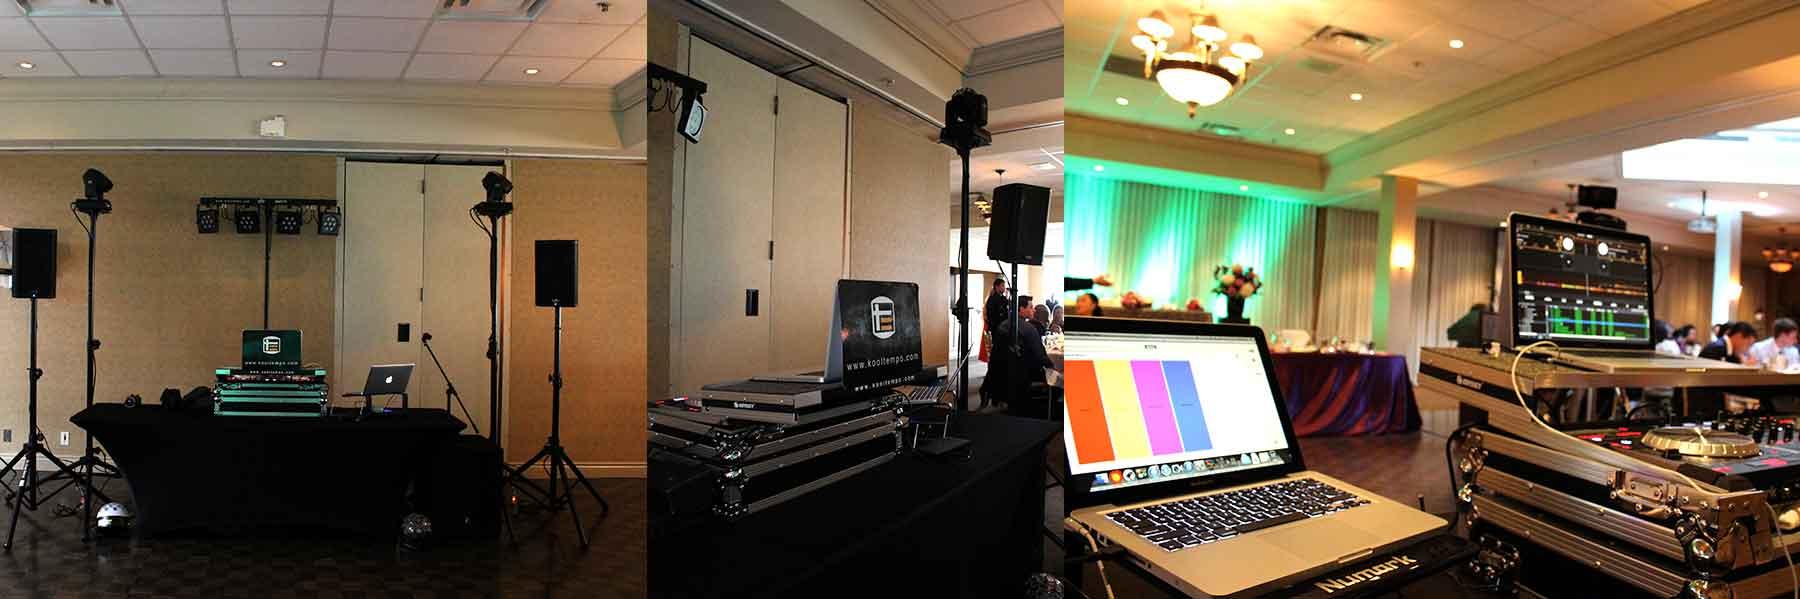 Wedding-DJ-Toronto-Set-up-at-Bayview-Golf-&-Country-Club